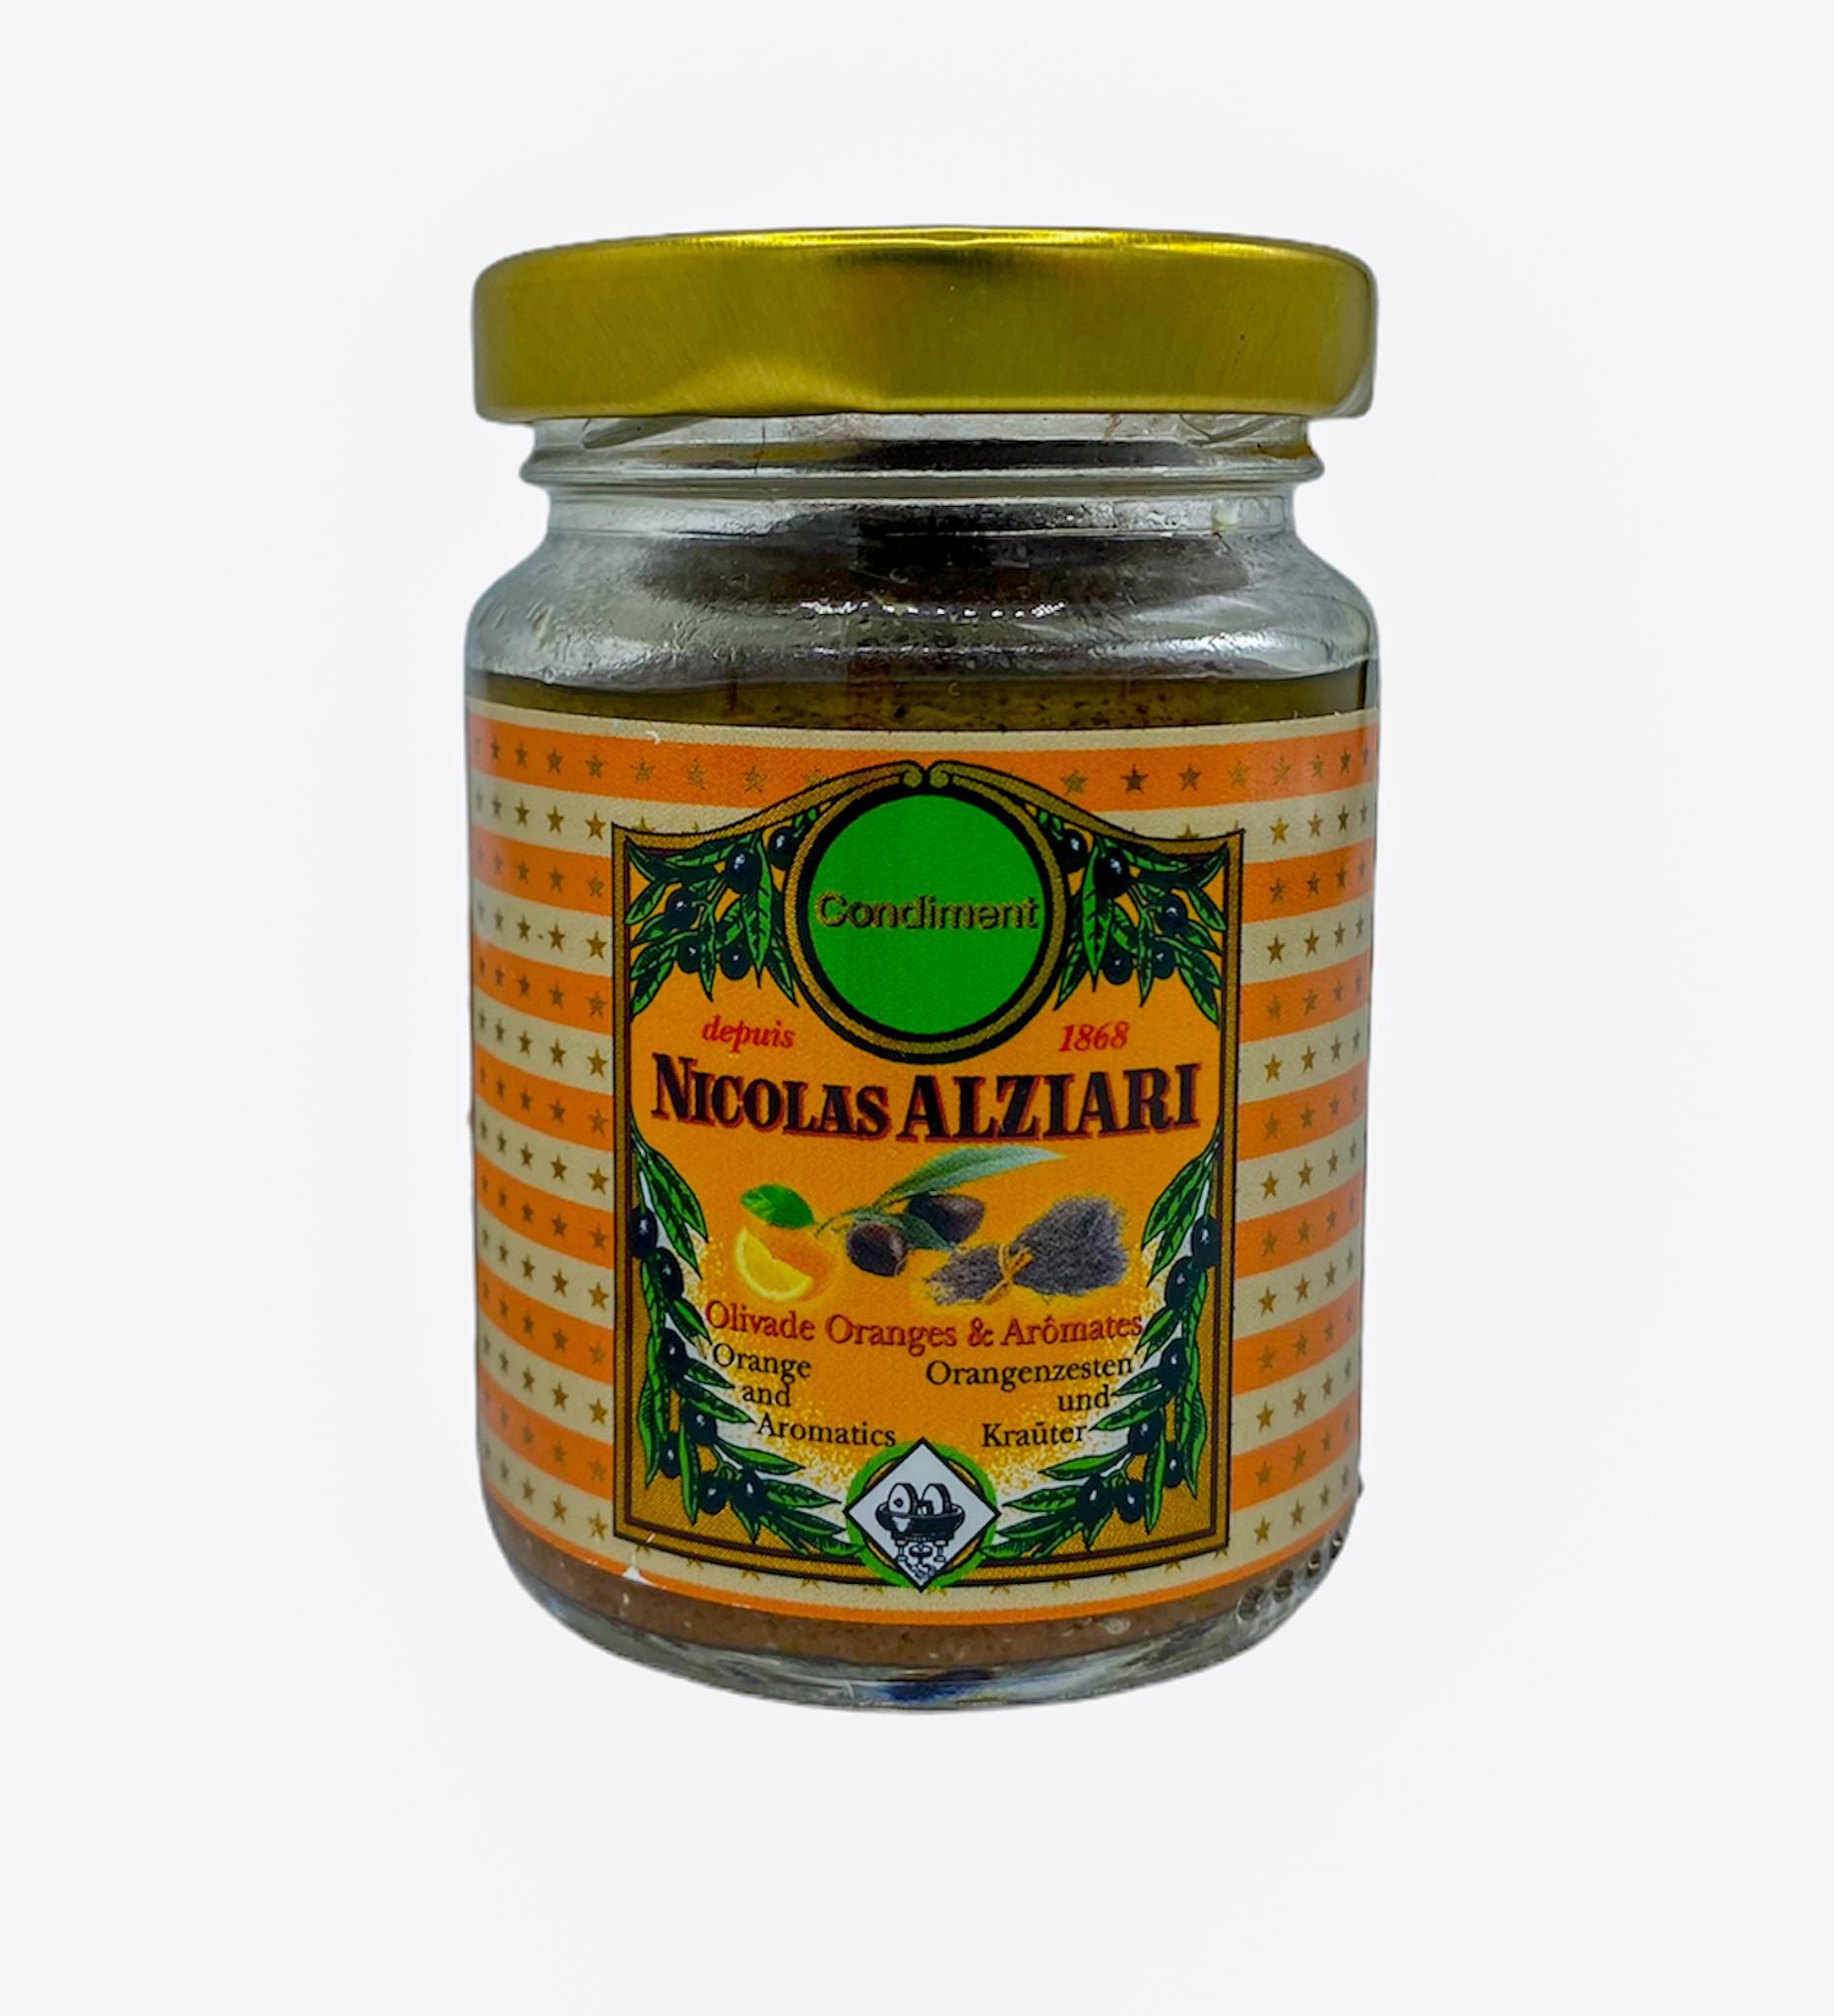 Olivade orange and aromatics 80g